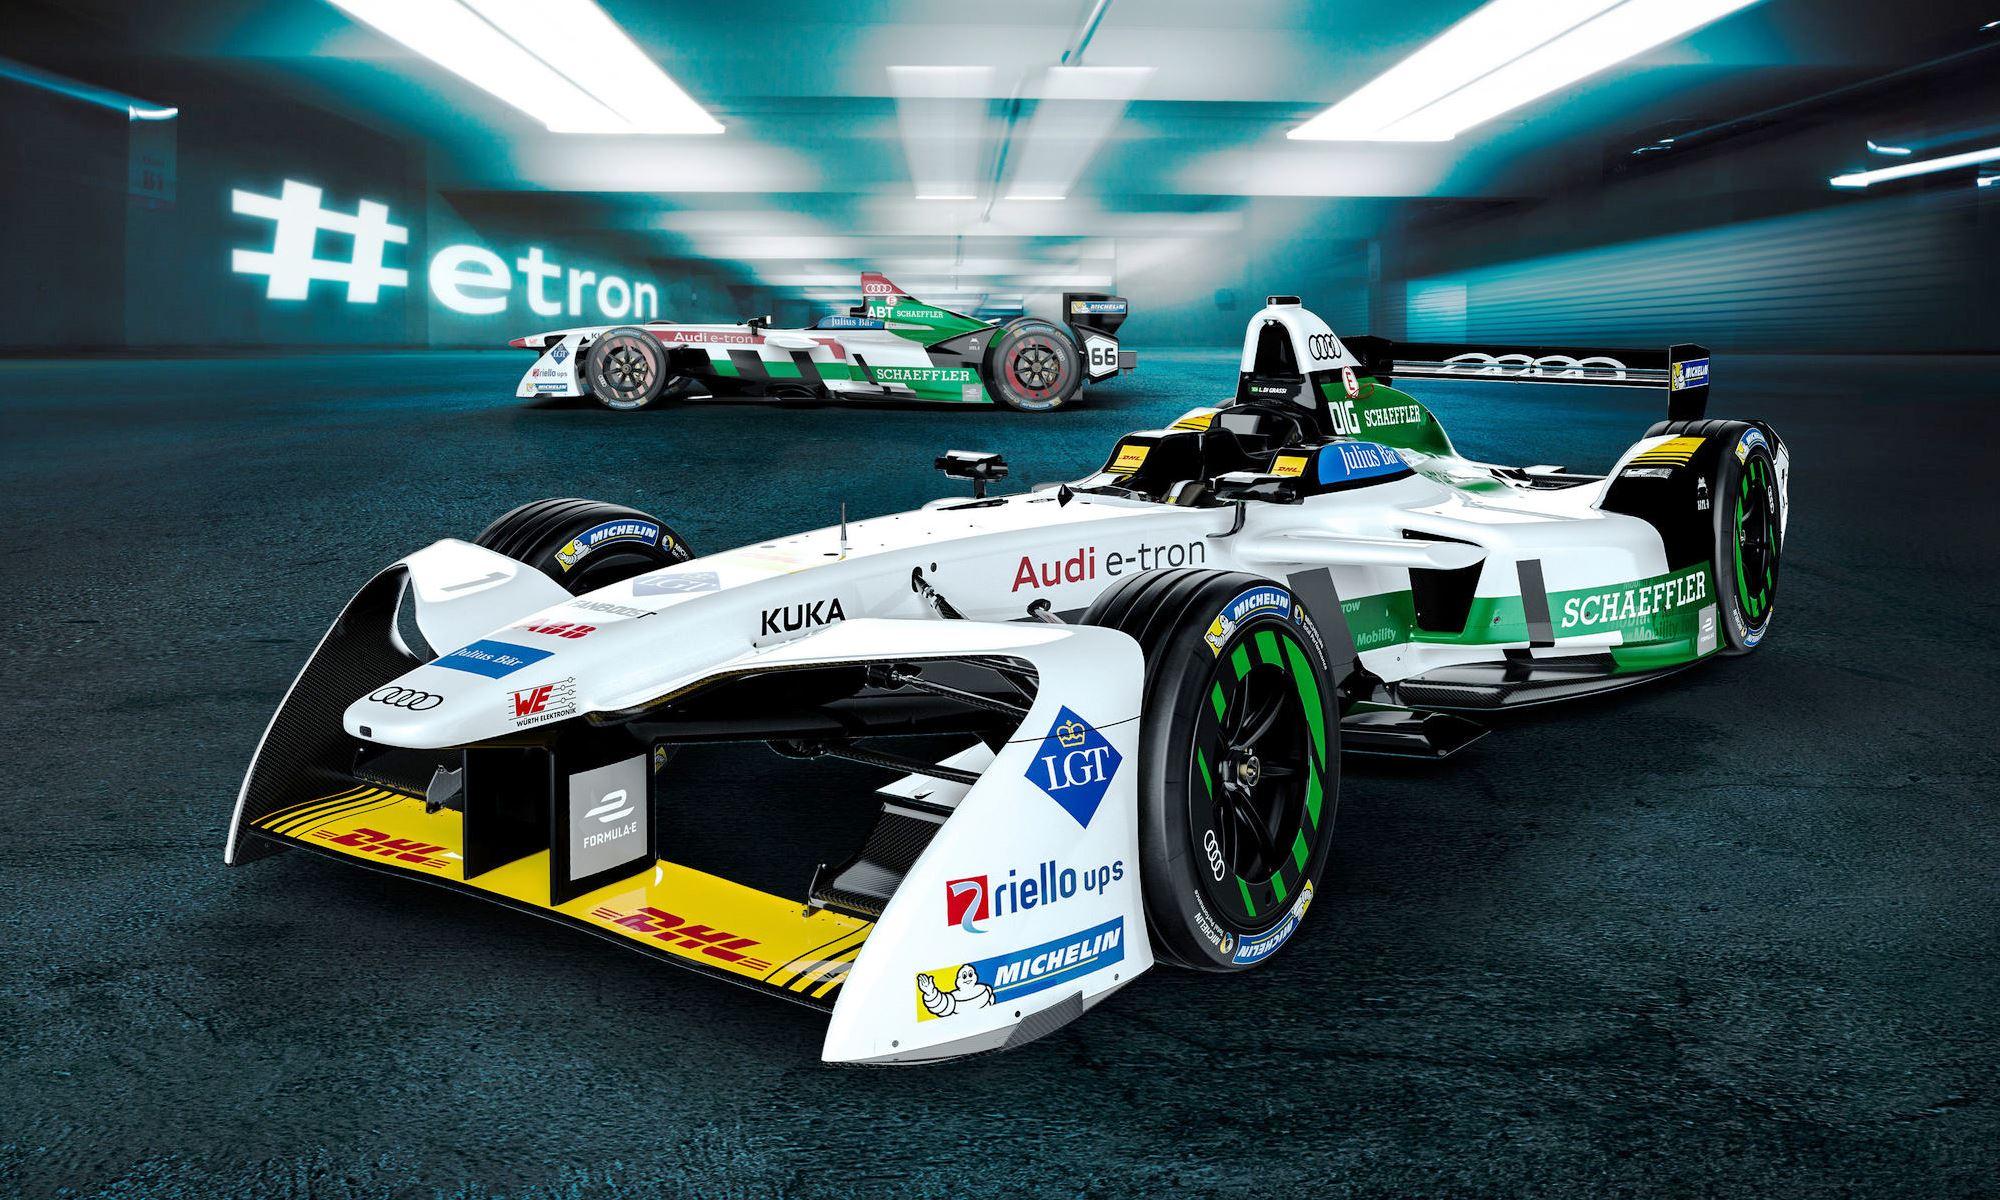 Audi Formula E racer